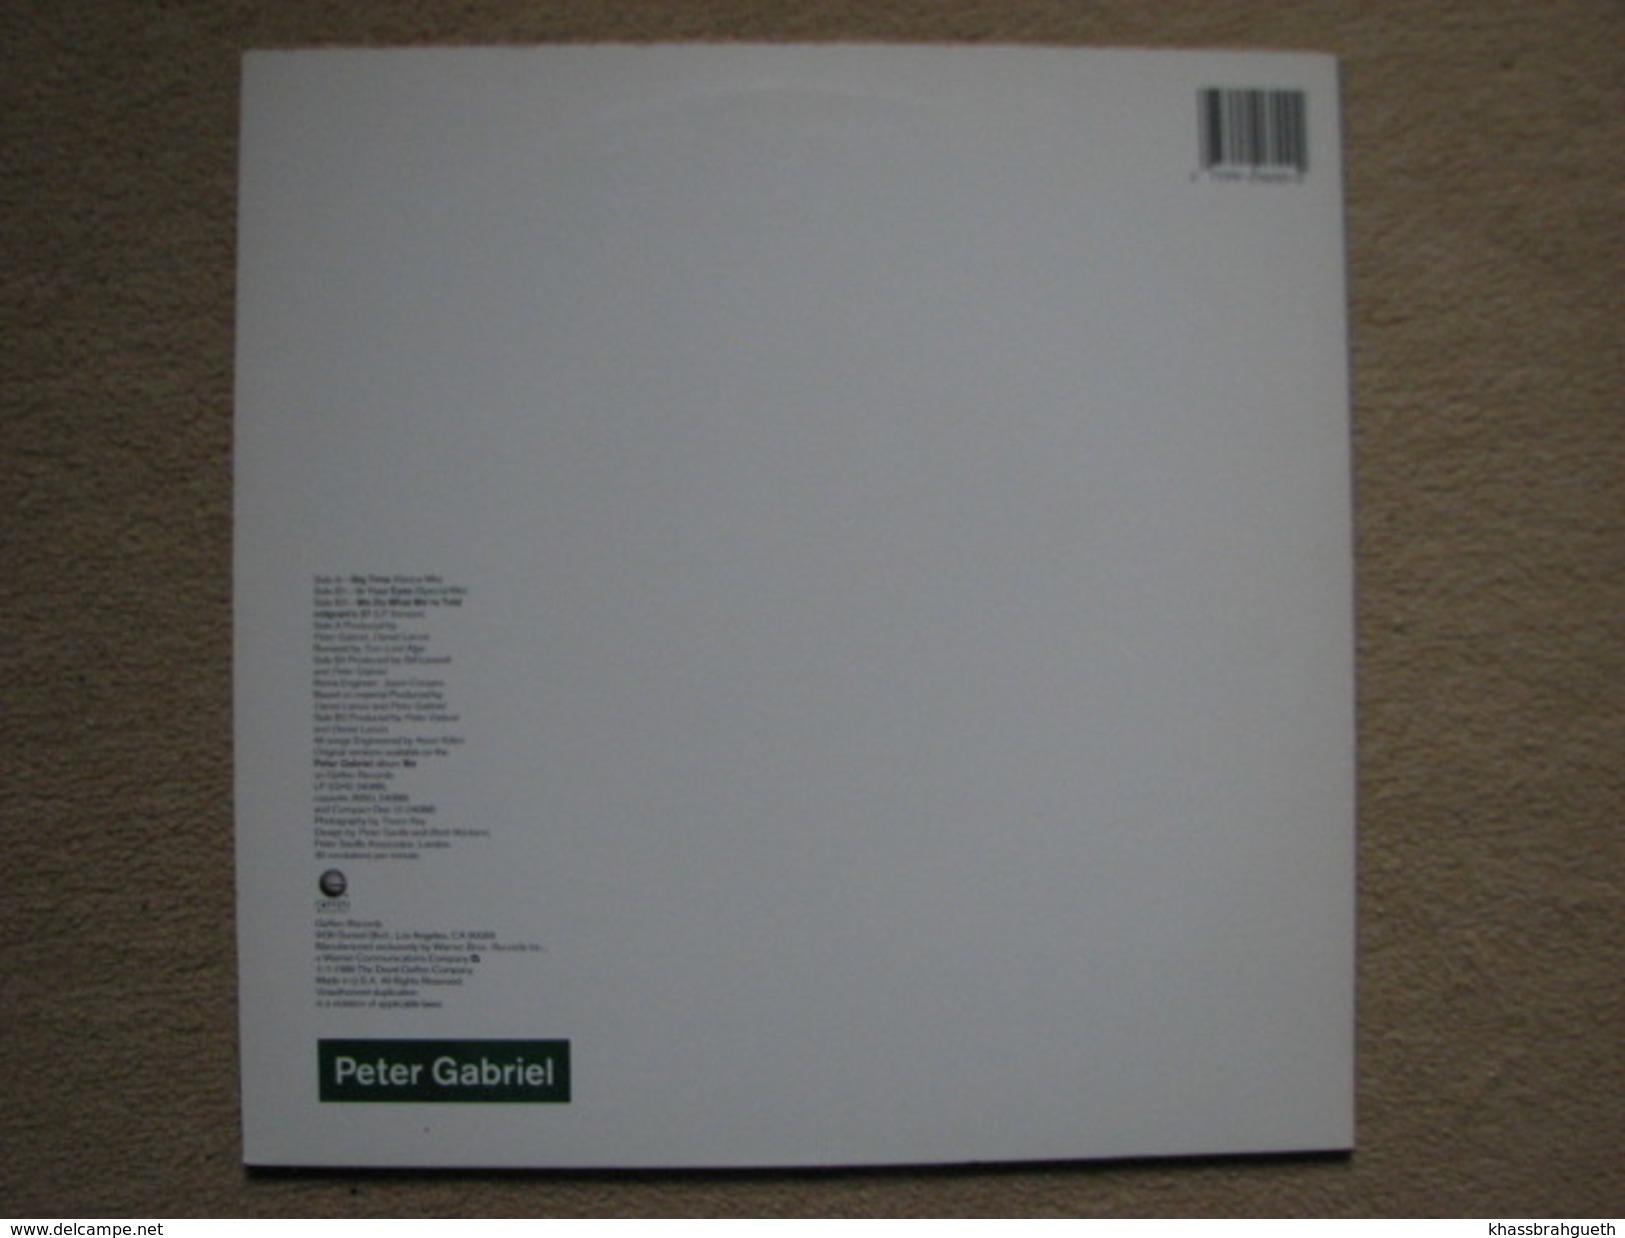 PETER GABRIEL - BIG TIME - MAXI (GREFFEN RECORDS 1986) - 45 T - Maxi-Single